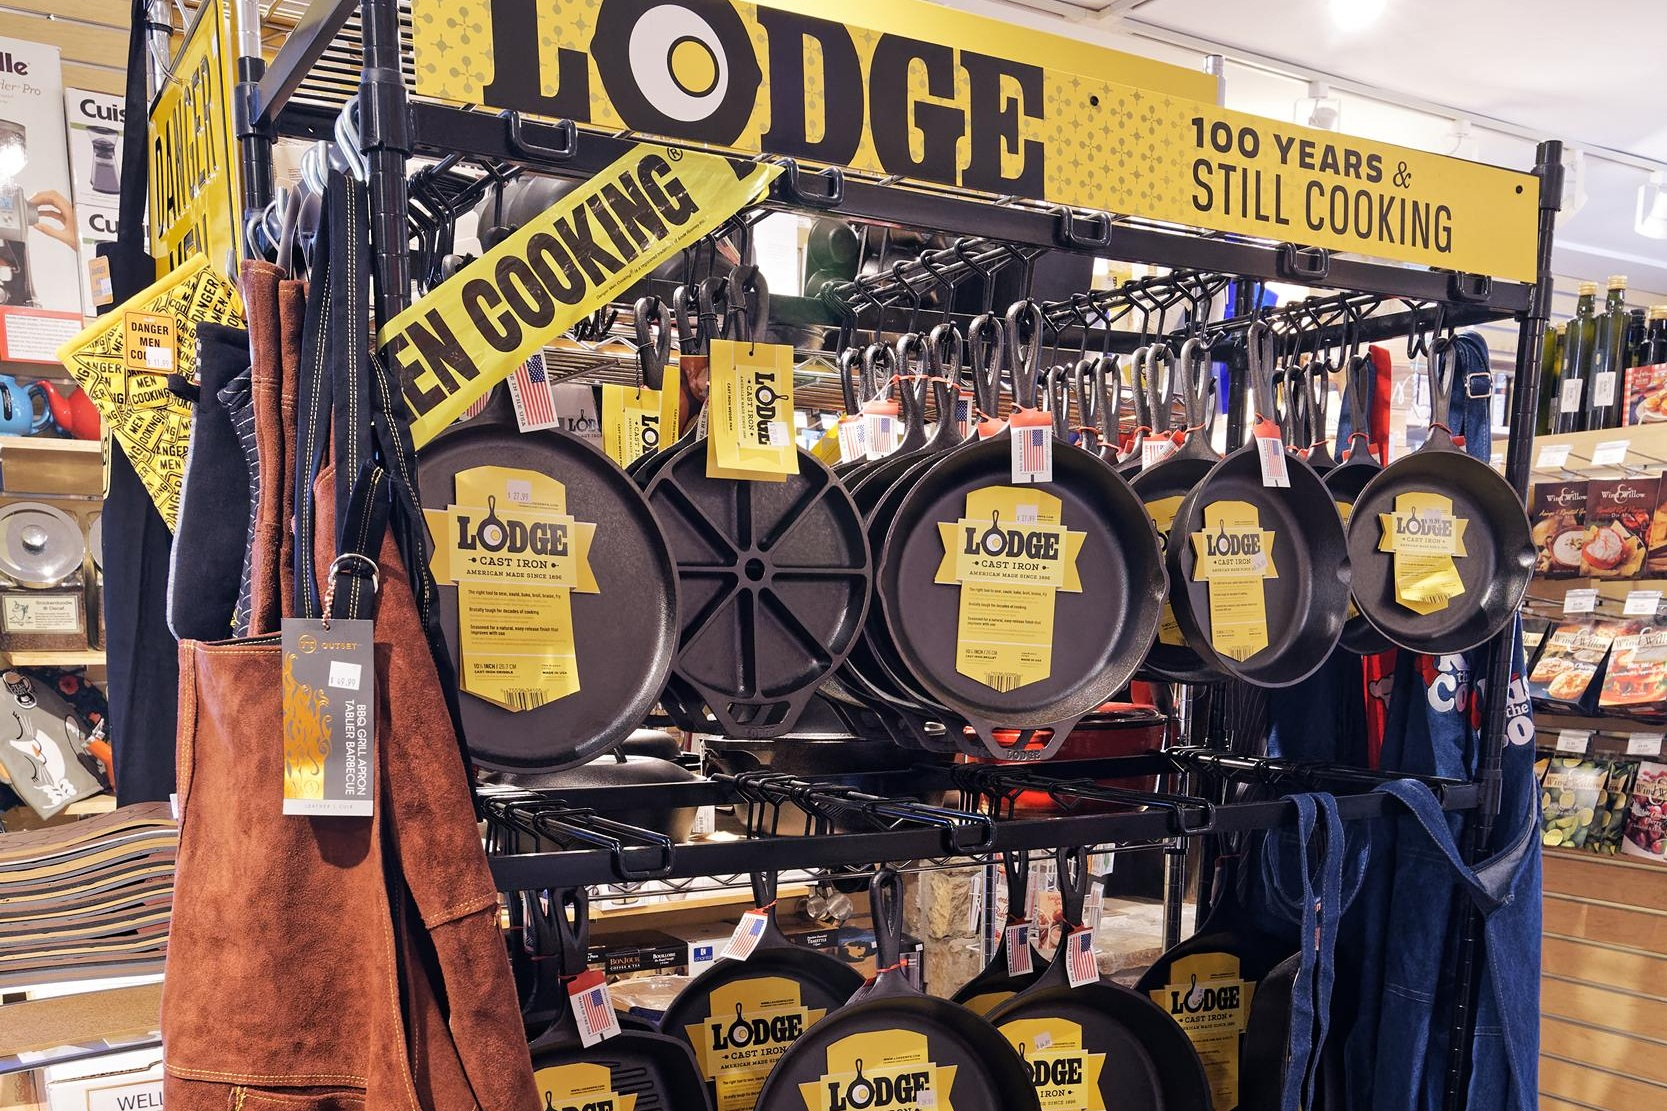 ktc-smaller-lodge.jpg